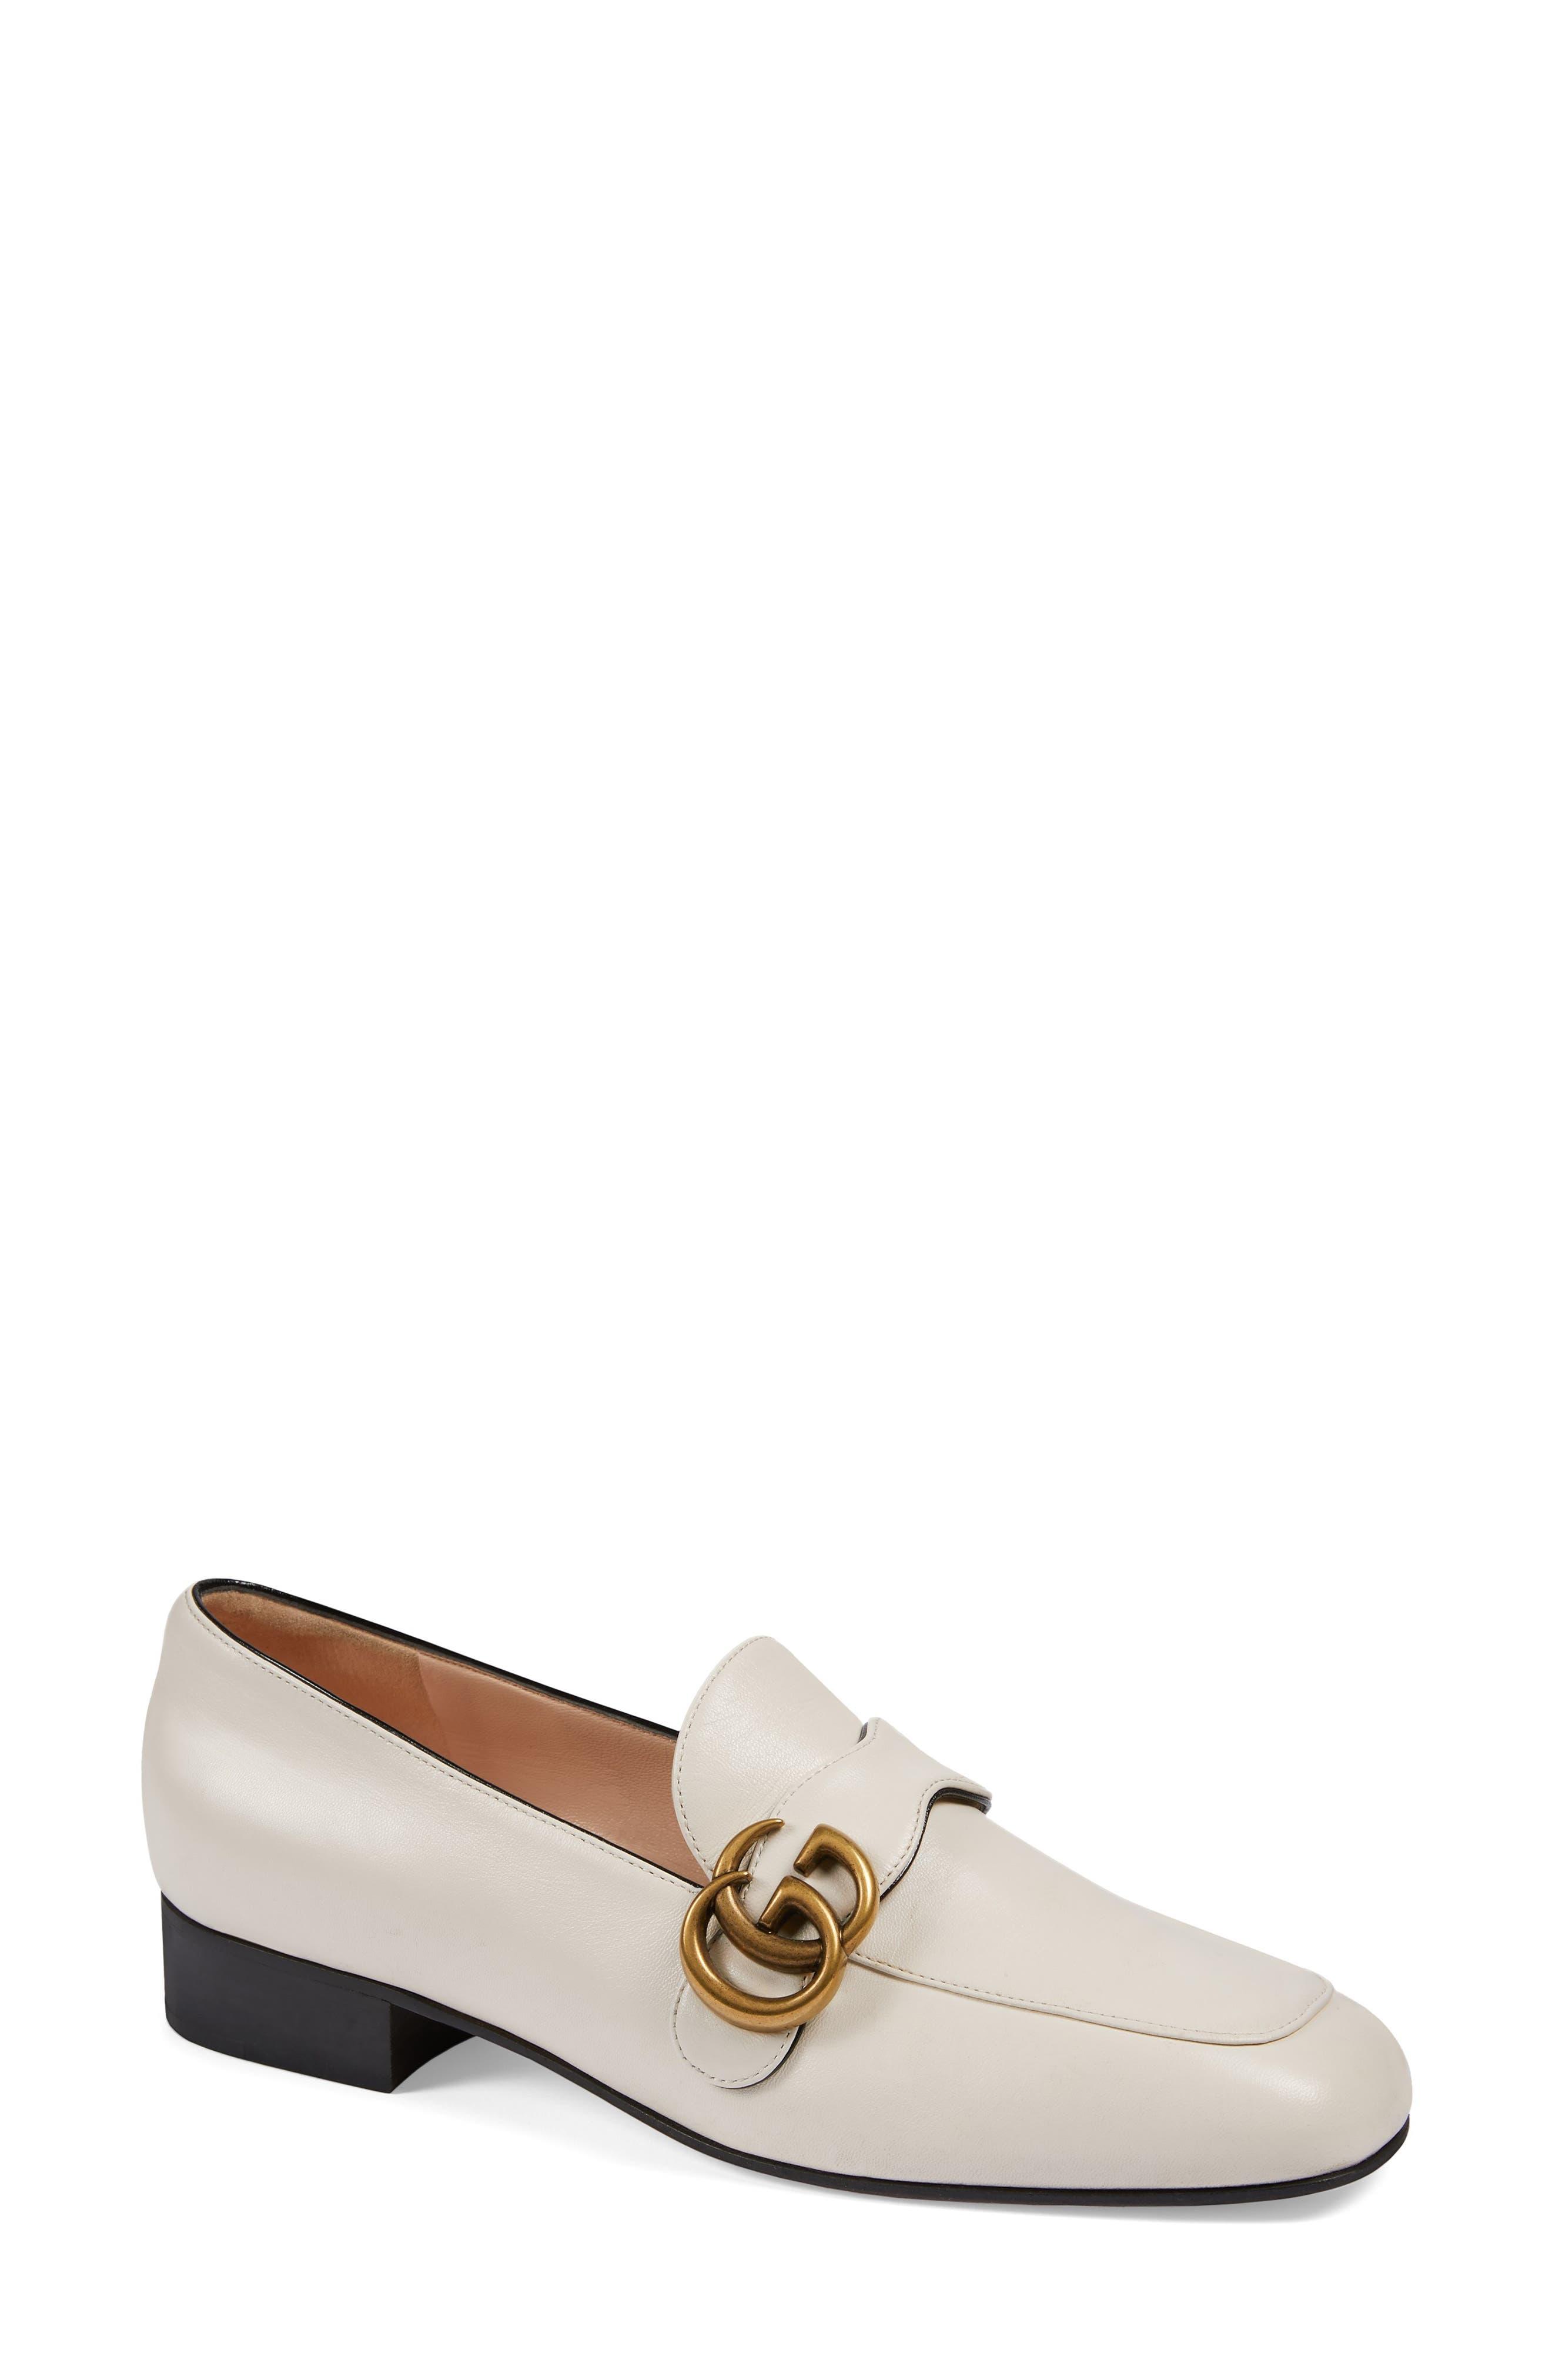 Women's Loafers \u0026 Oxfords | Nordstrom